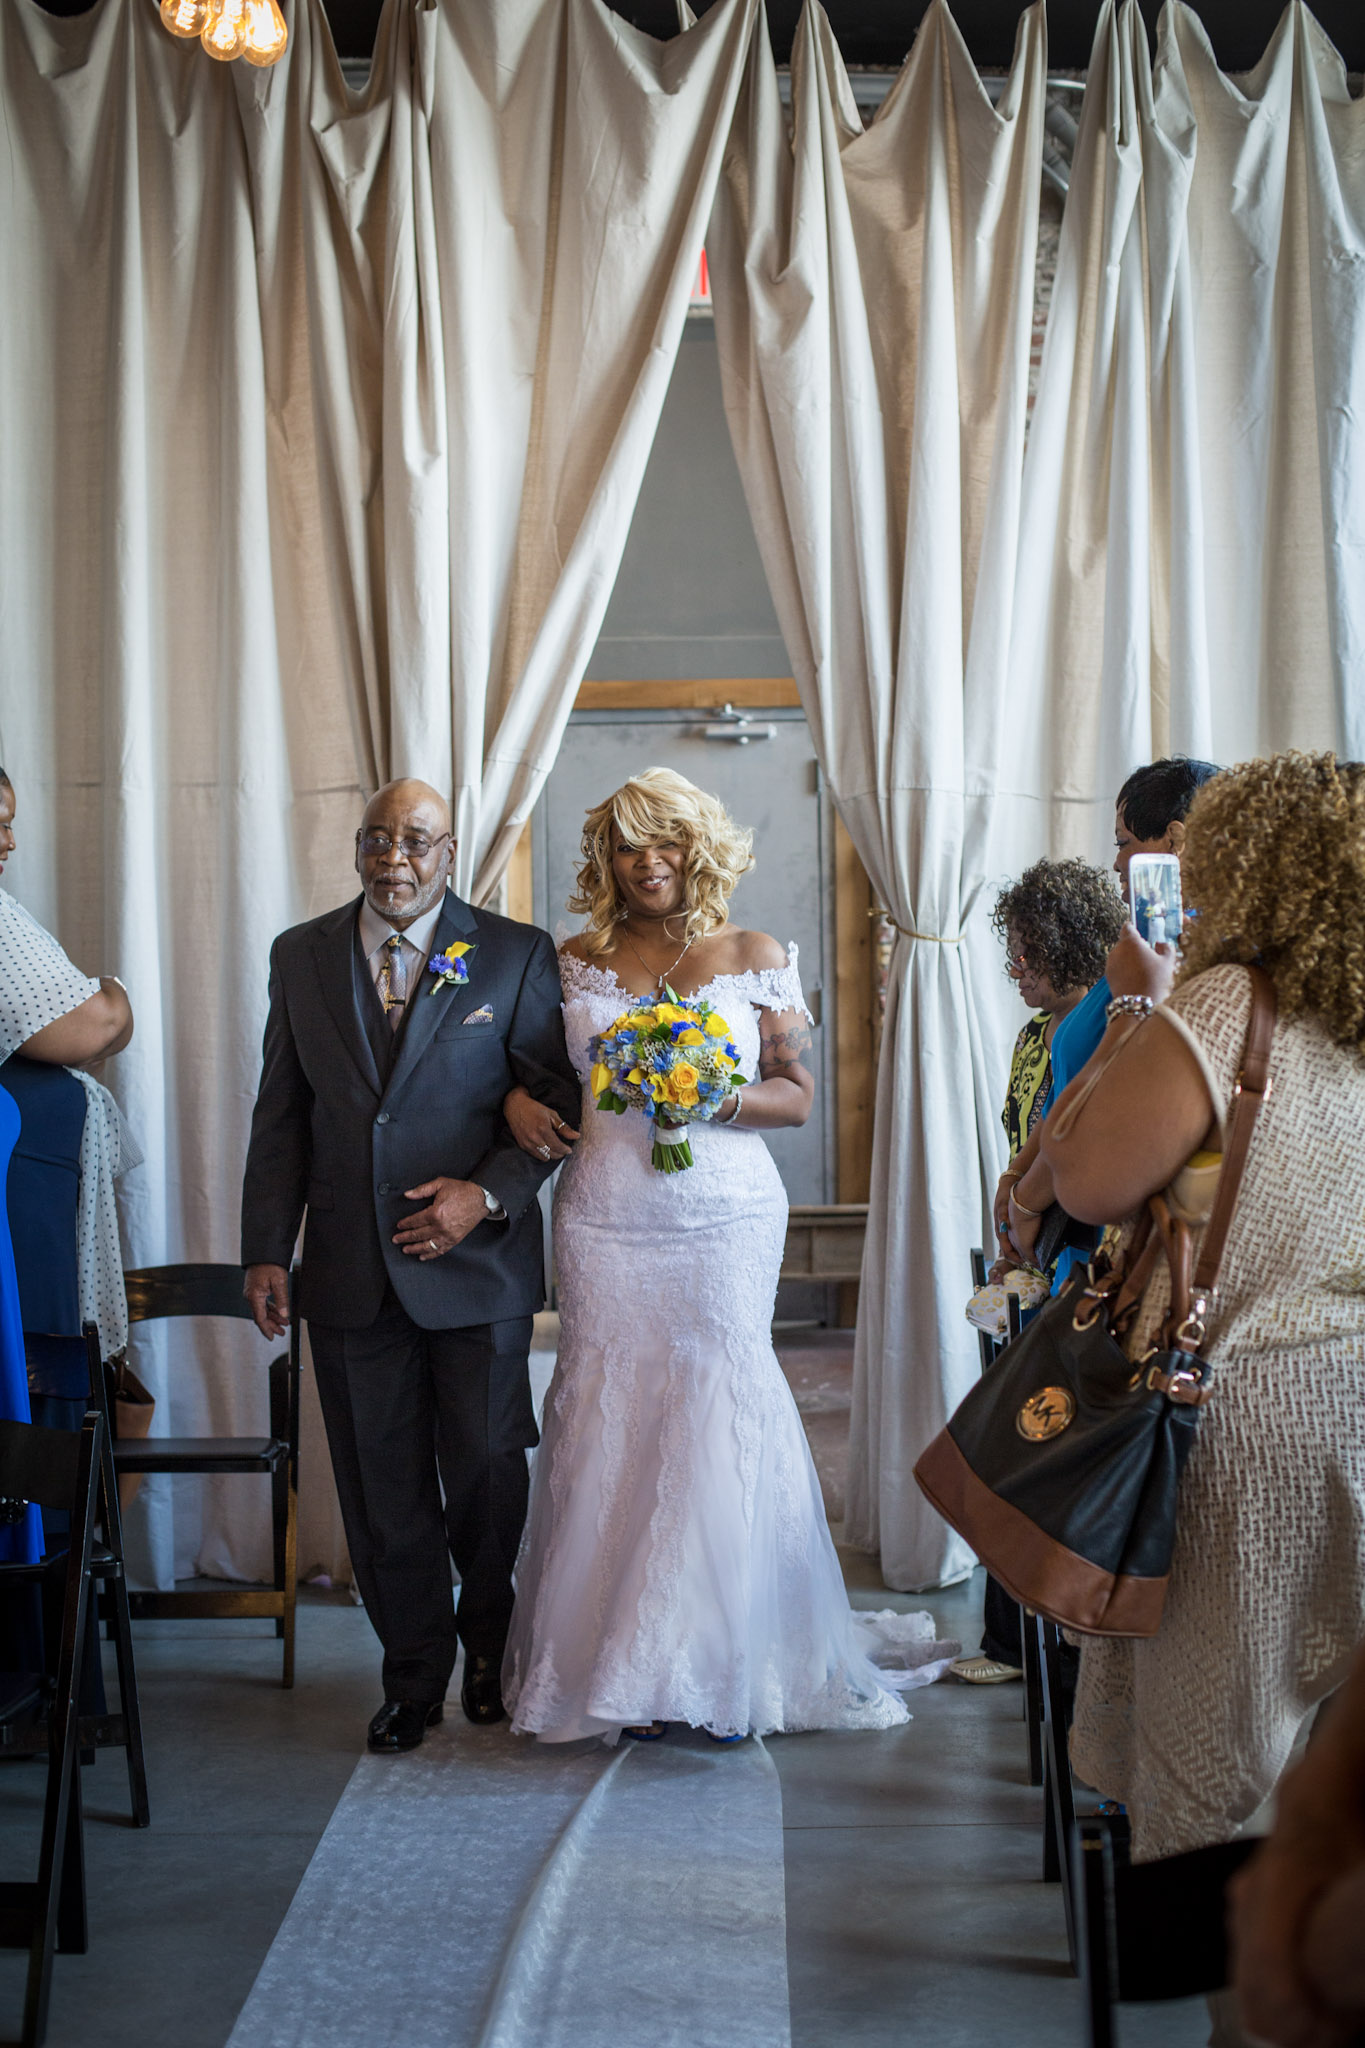 The_Vow_Exchange_Kansas_City_Small_Budget_Wedding_Venue_Mico&Daniel-060.jpg